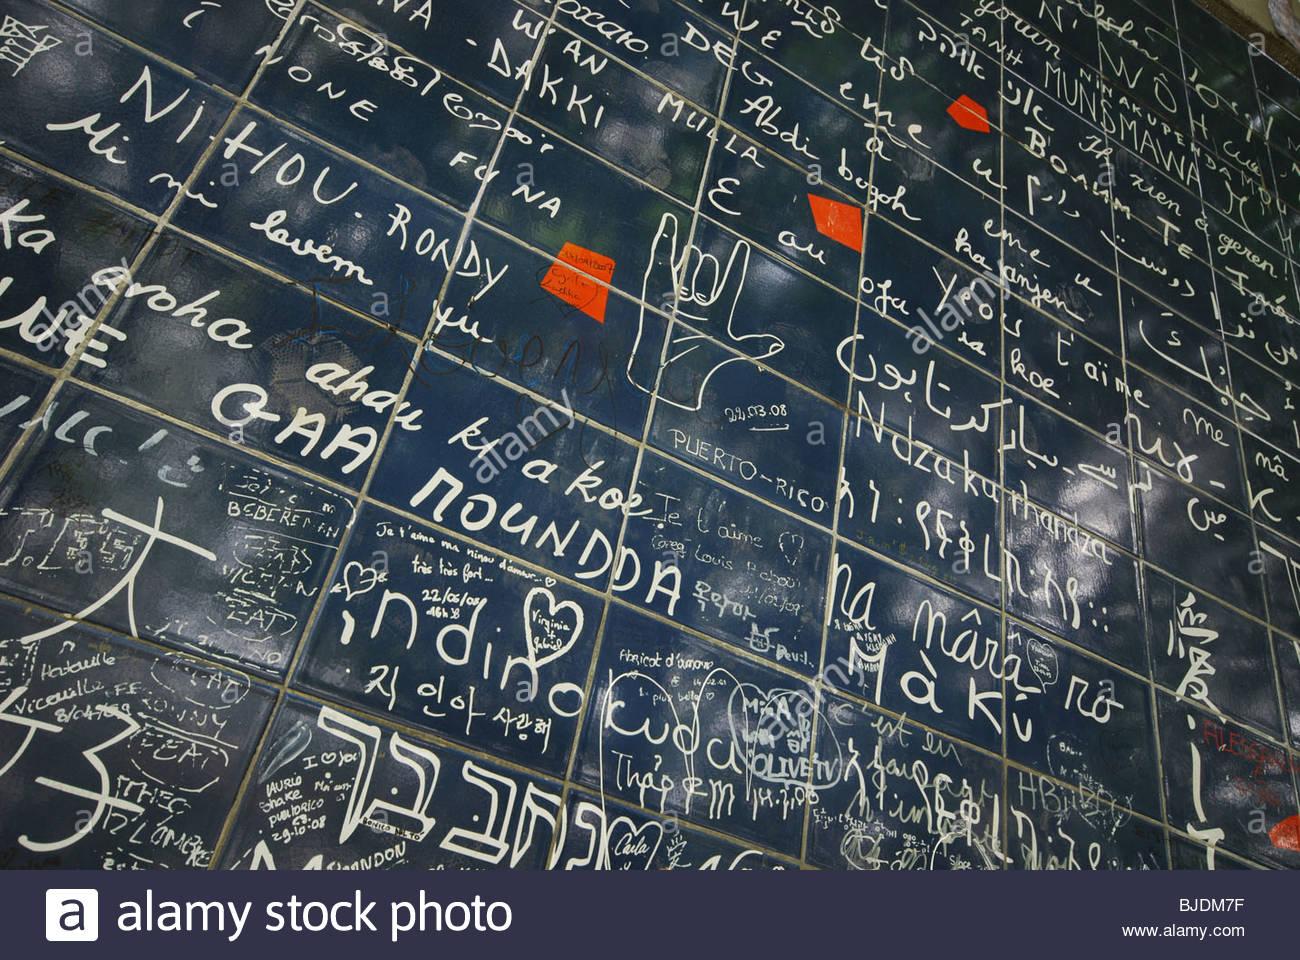 detail of Love Wall near Place des Abbesses Montmartre Paris France - Stock Image